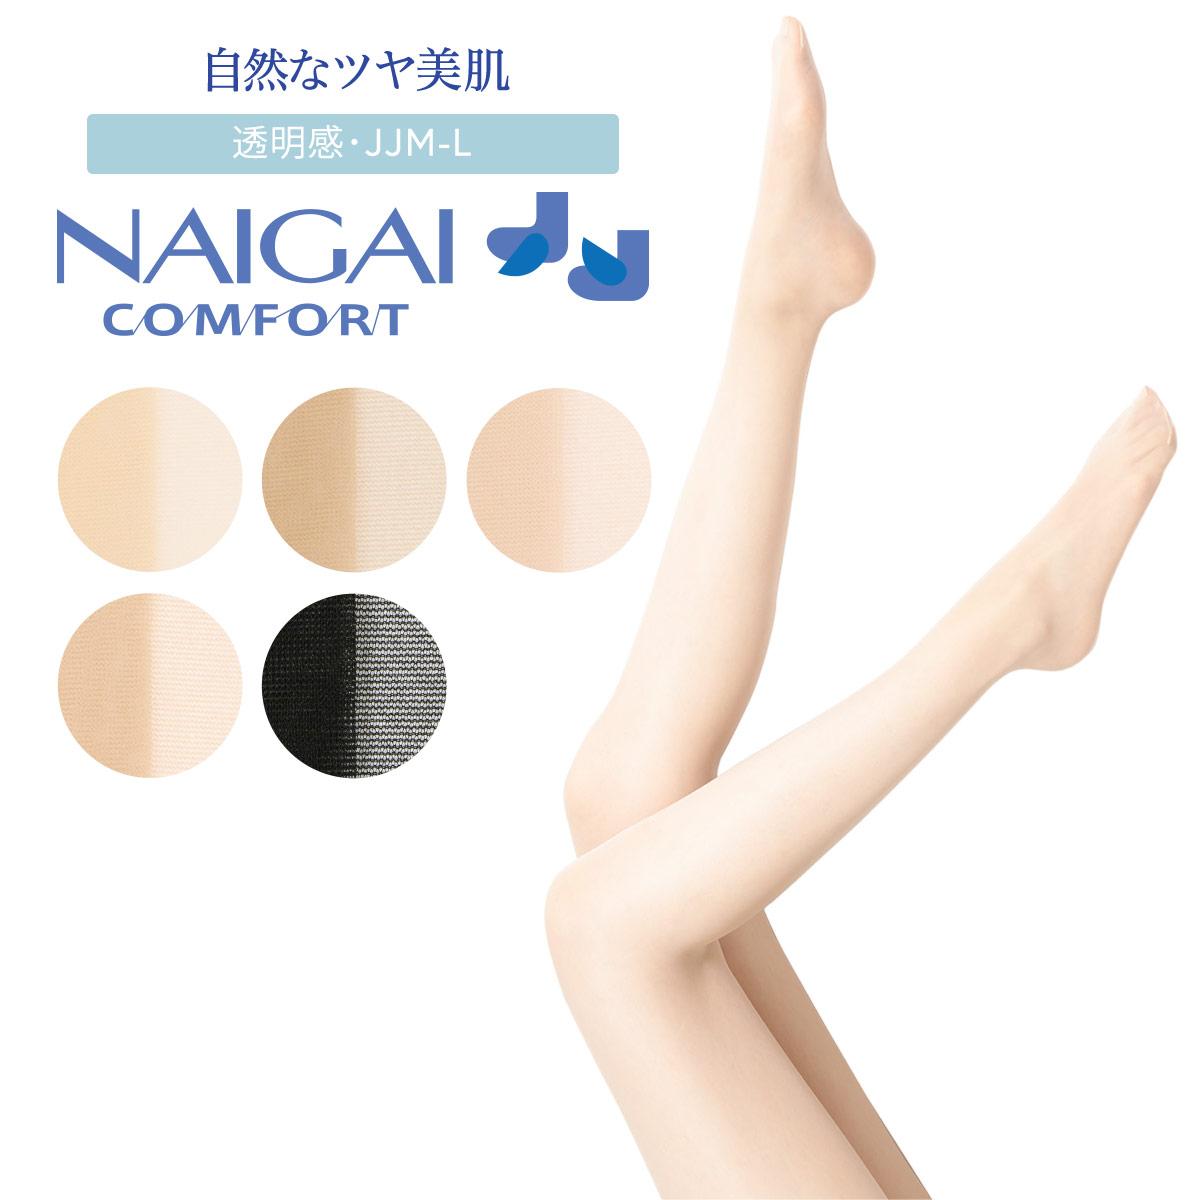 NAIGAI COMFORT ナイガイ コンフォート レディース ストッキング 交編 つま先スルー 素肌的クリア肌 1003021【ゆうパケット・4点まで】